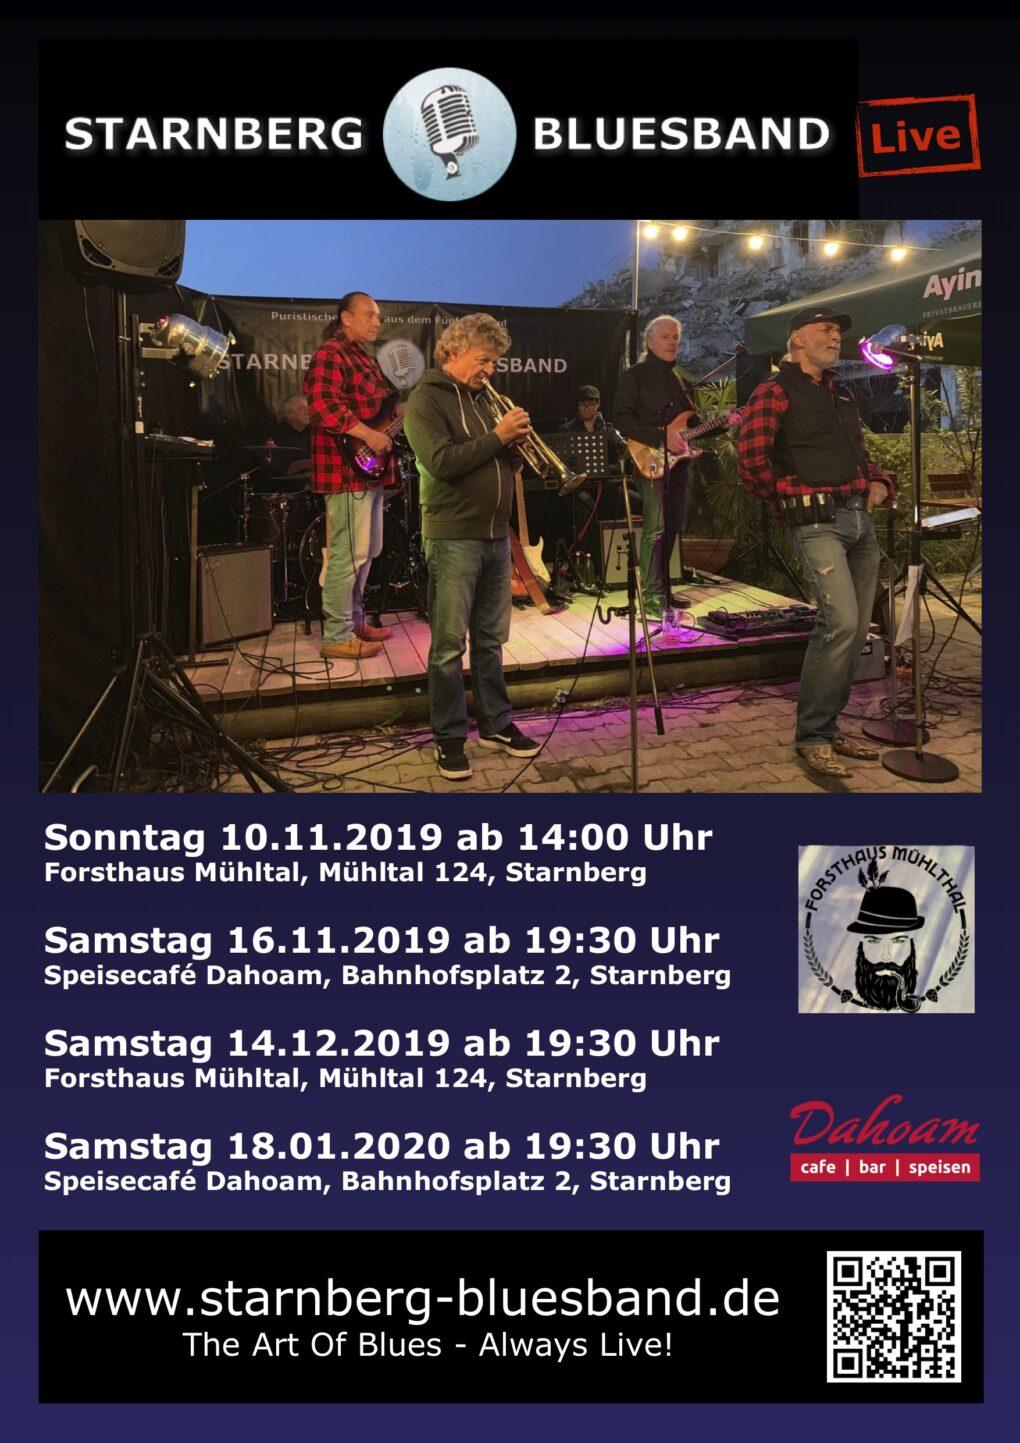 Starnberg Bluesband